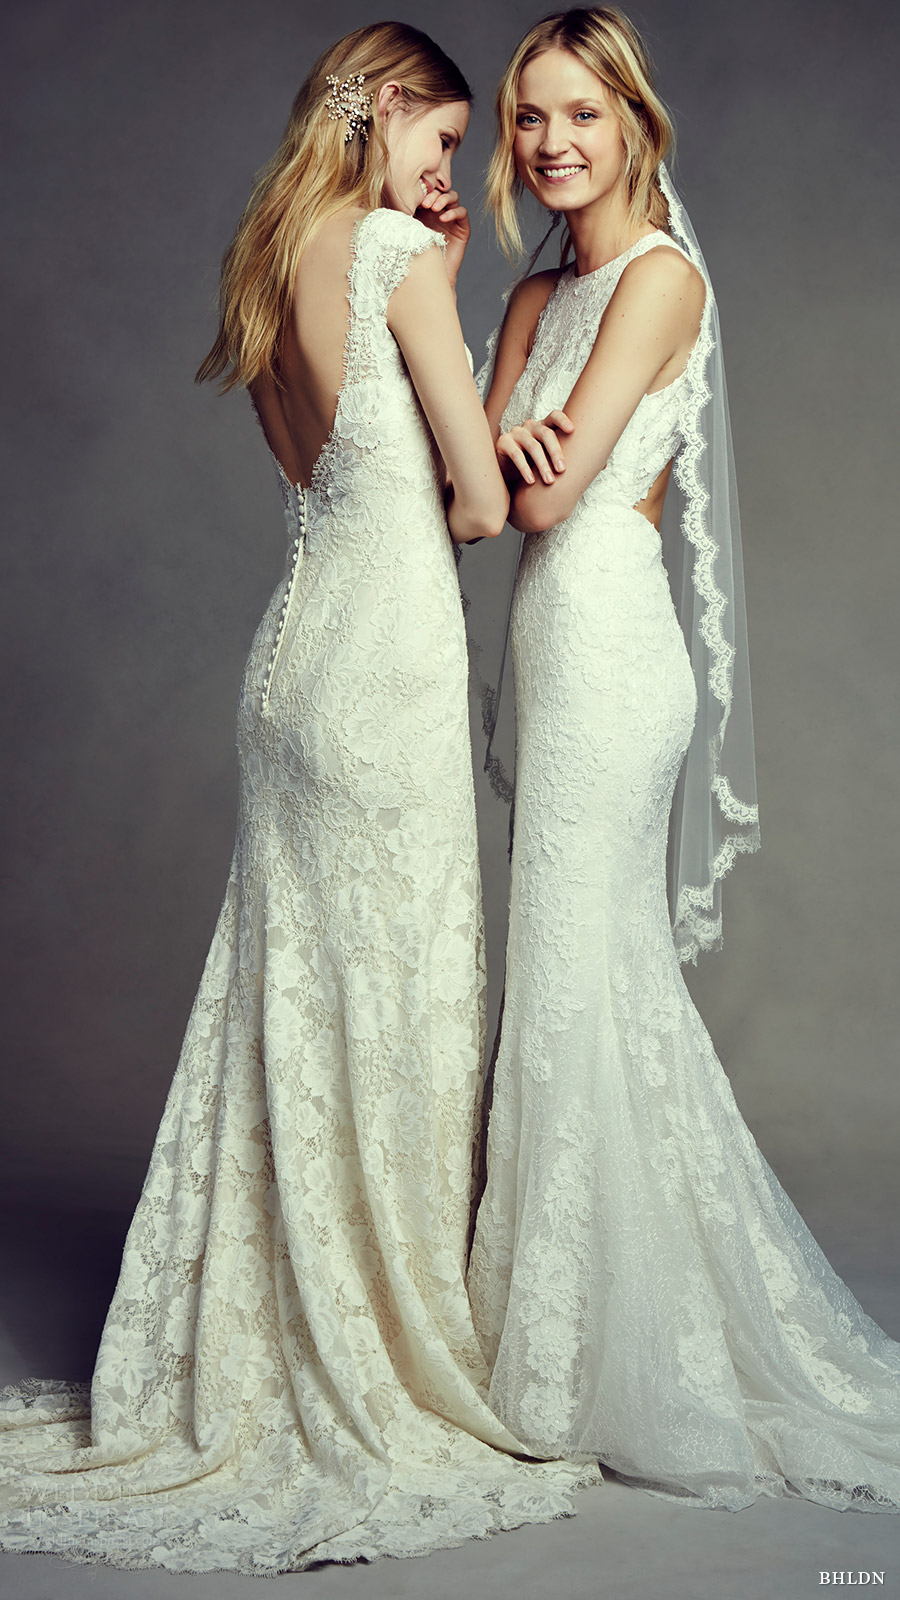 bhldn bridal may 2016 amalia lace wedding dress bv jensen gown fv